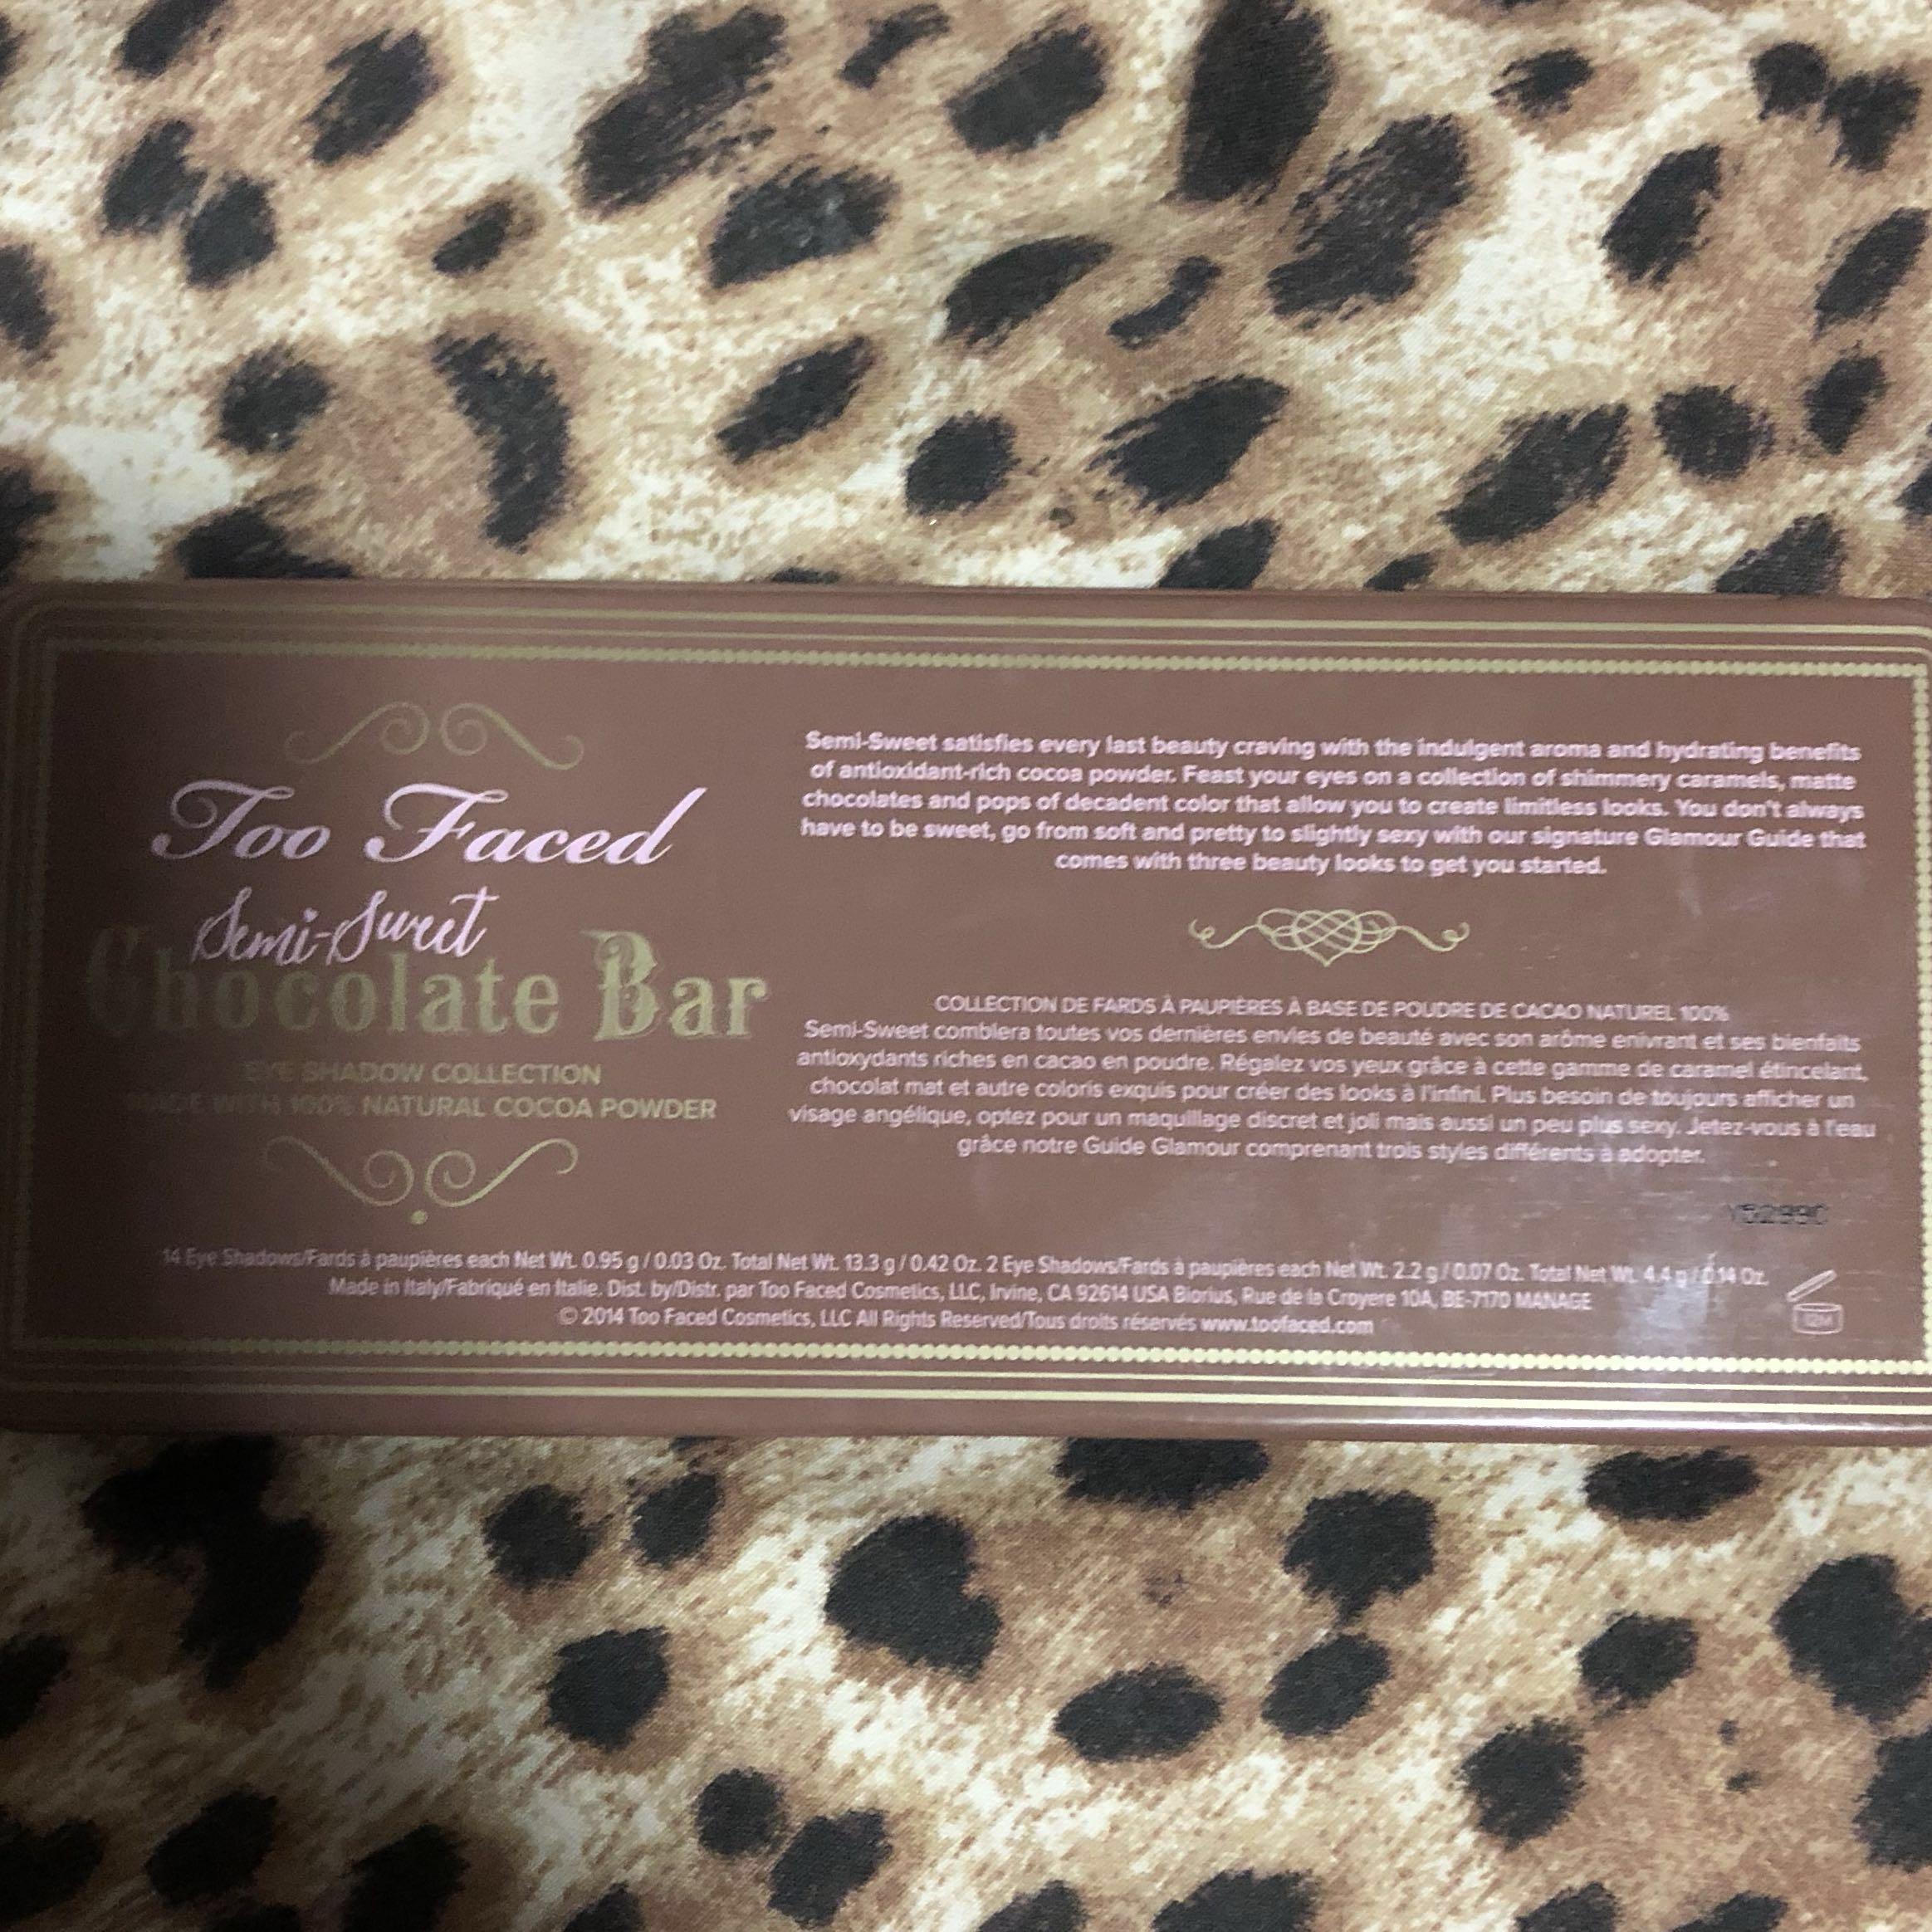 Too Faced Semi- Sweet Chocolate Bar Palette